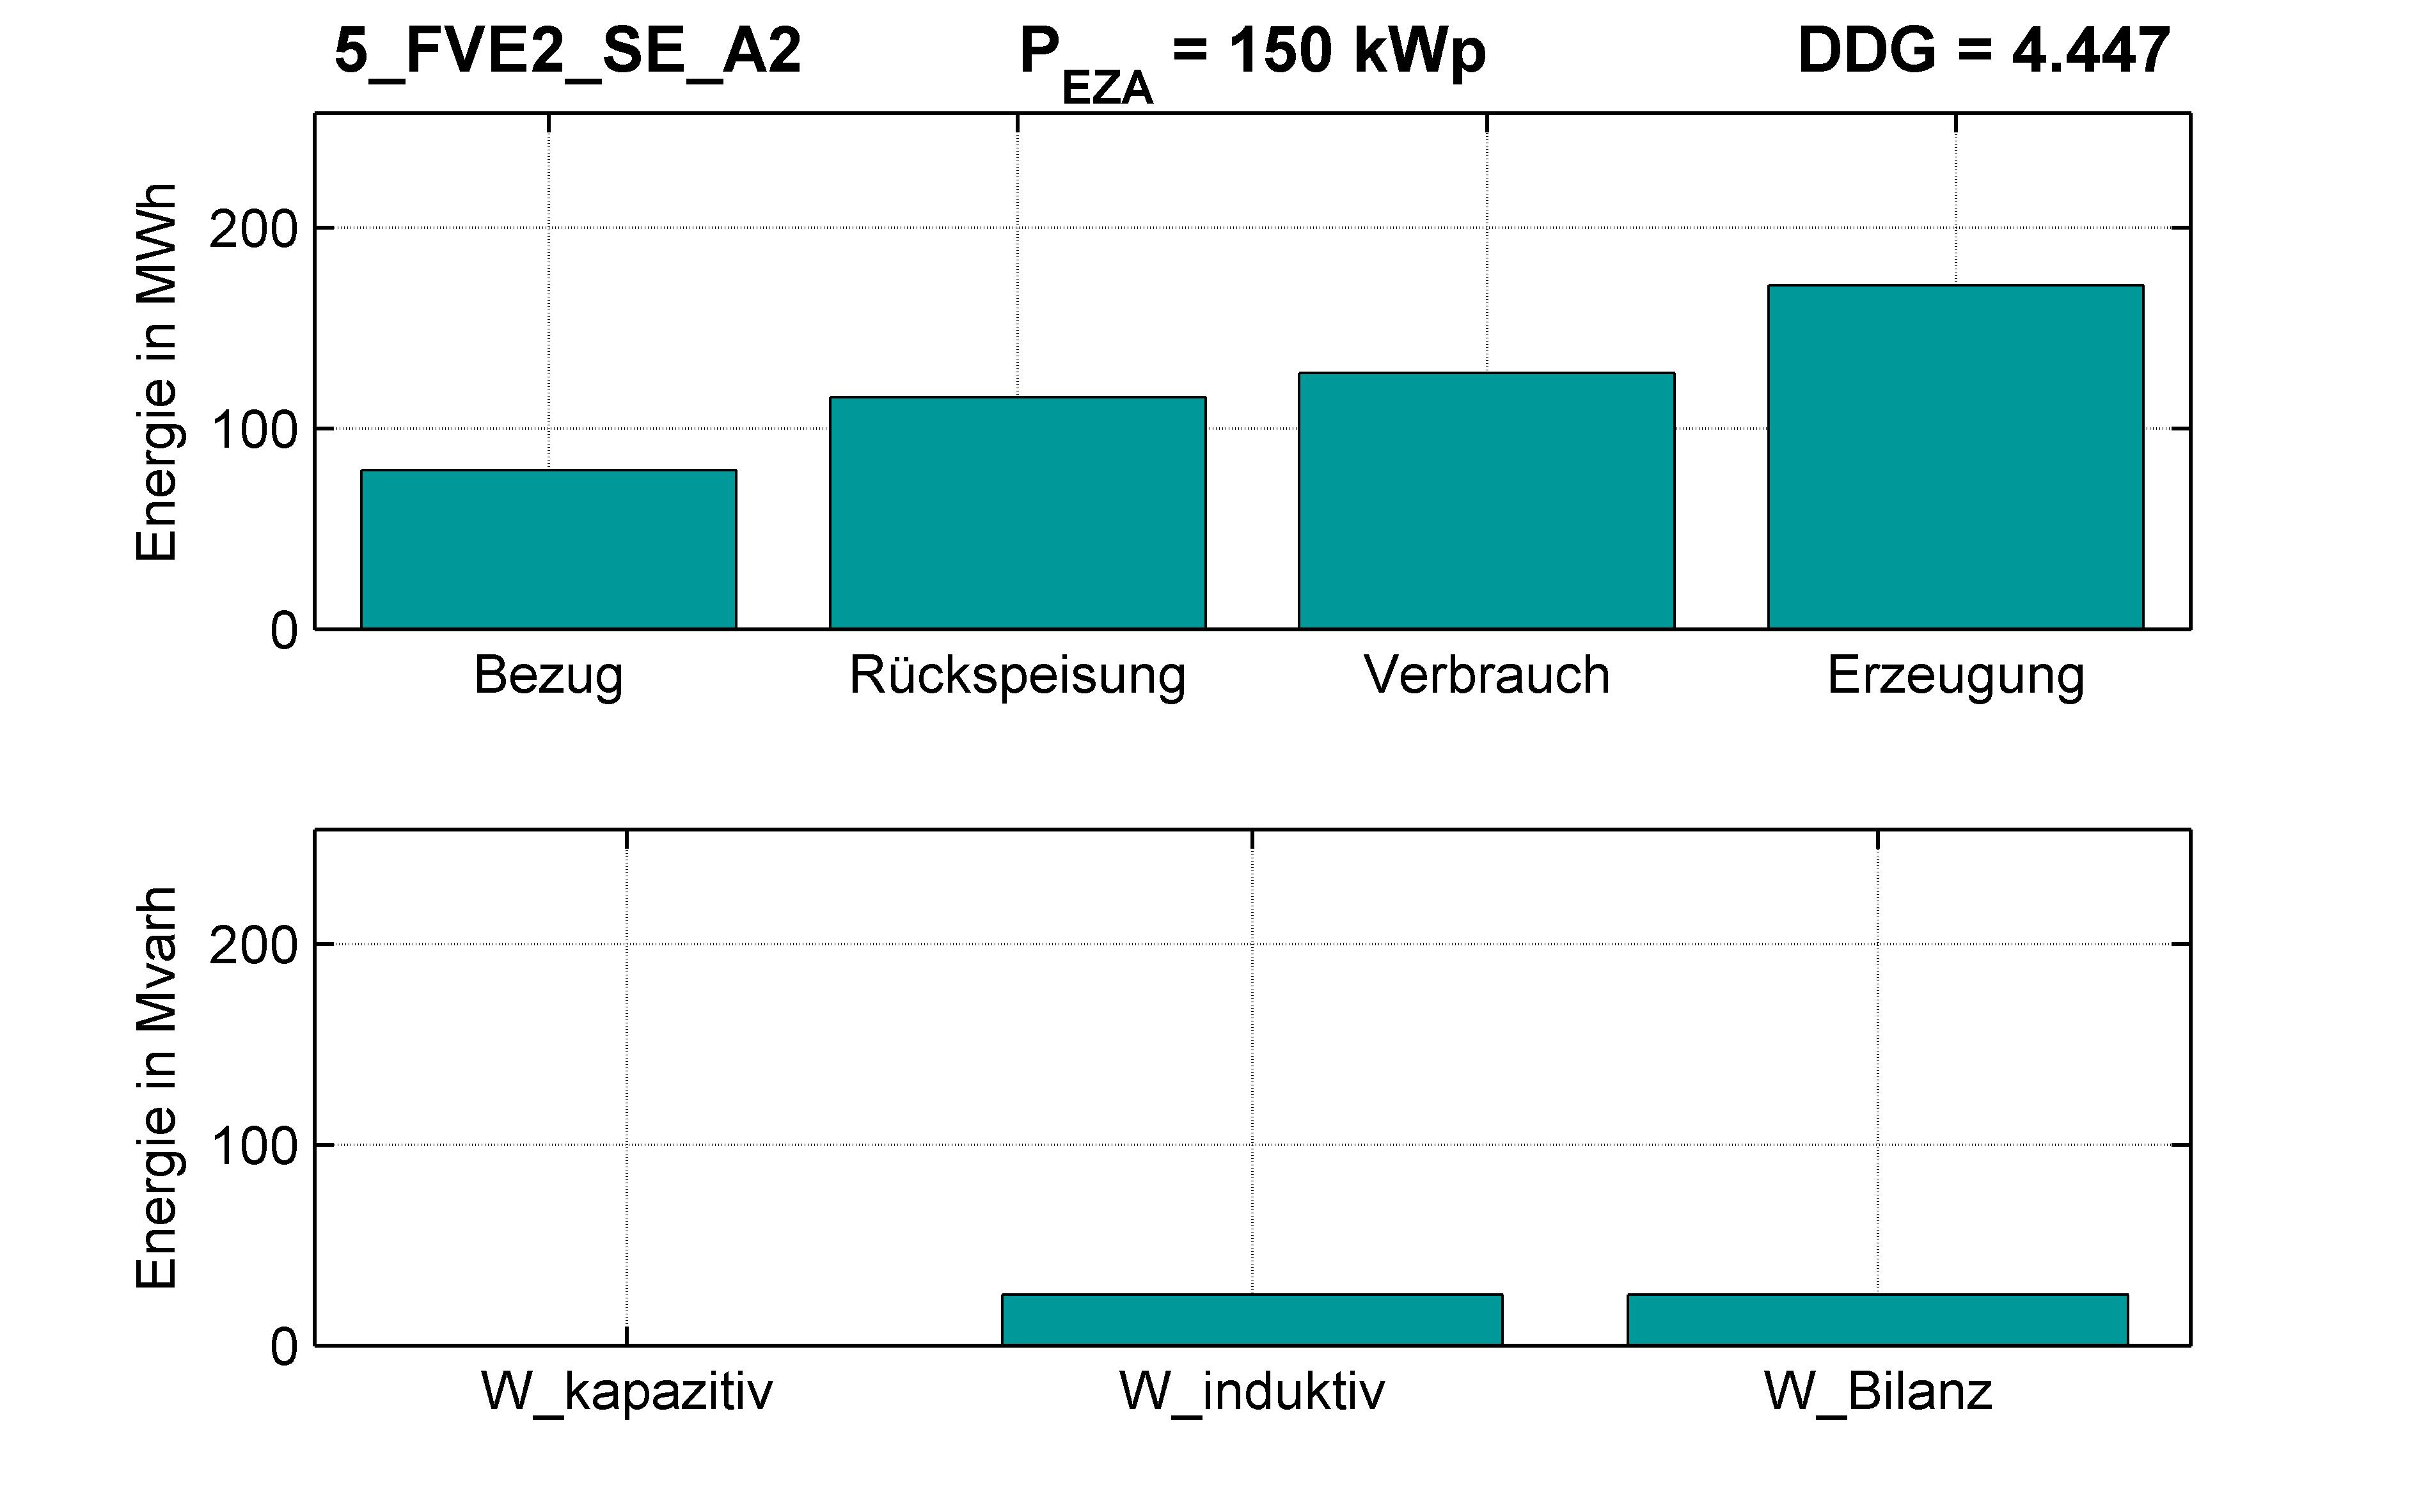 FVE2 | STATION (SE) A2 | PQ-Bilanz